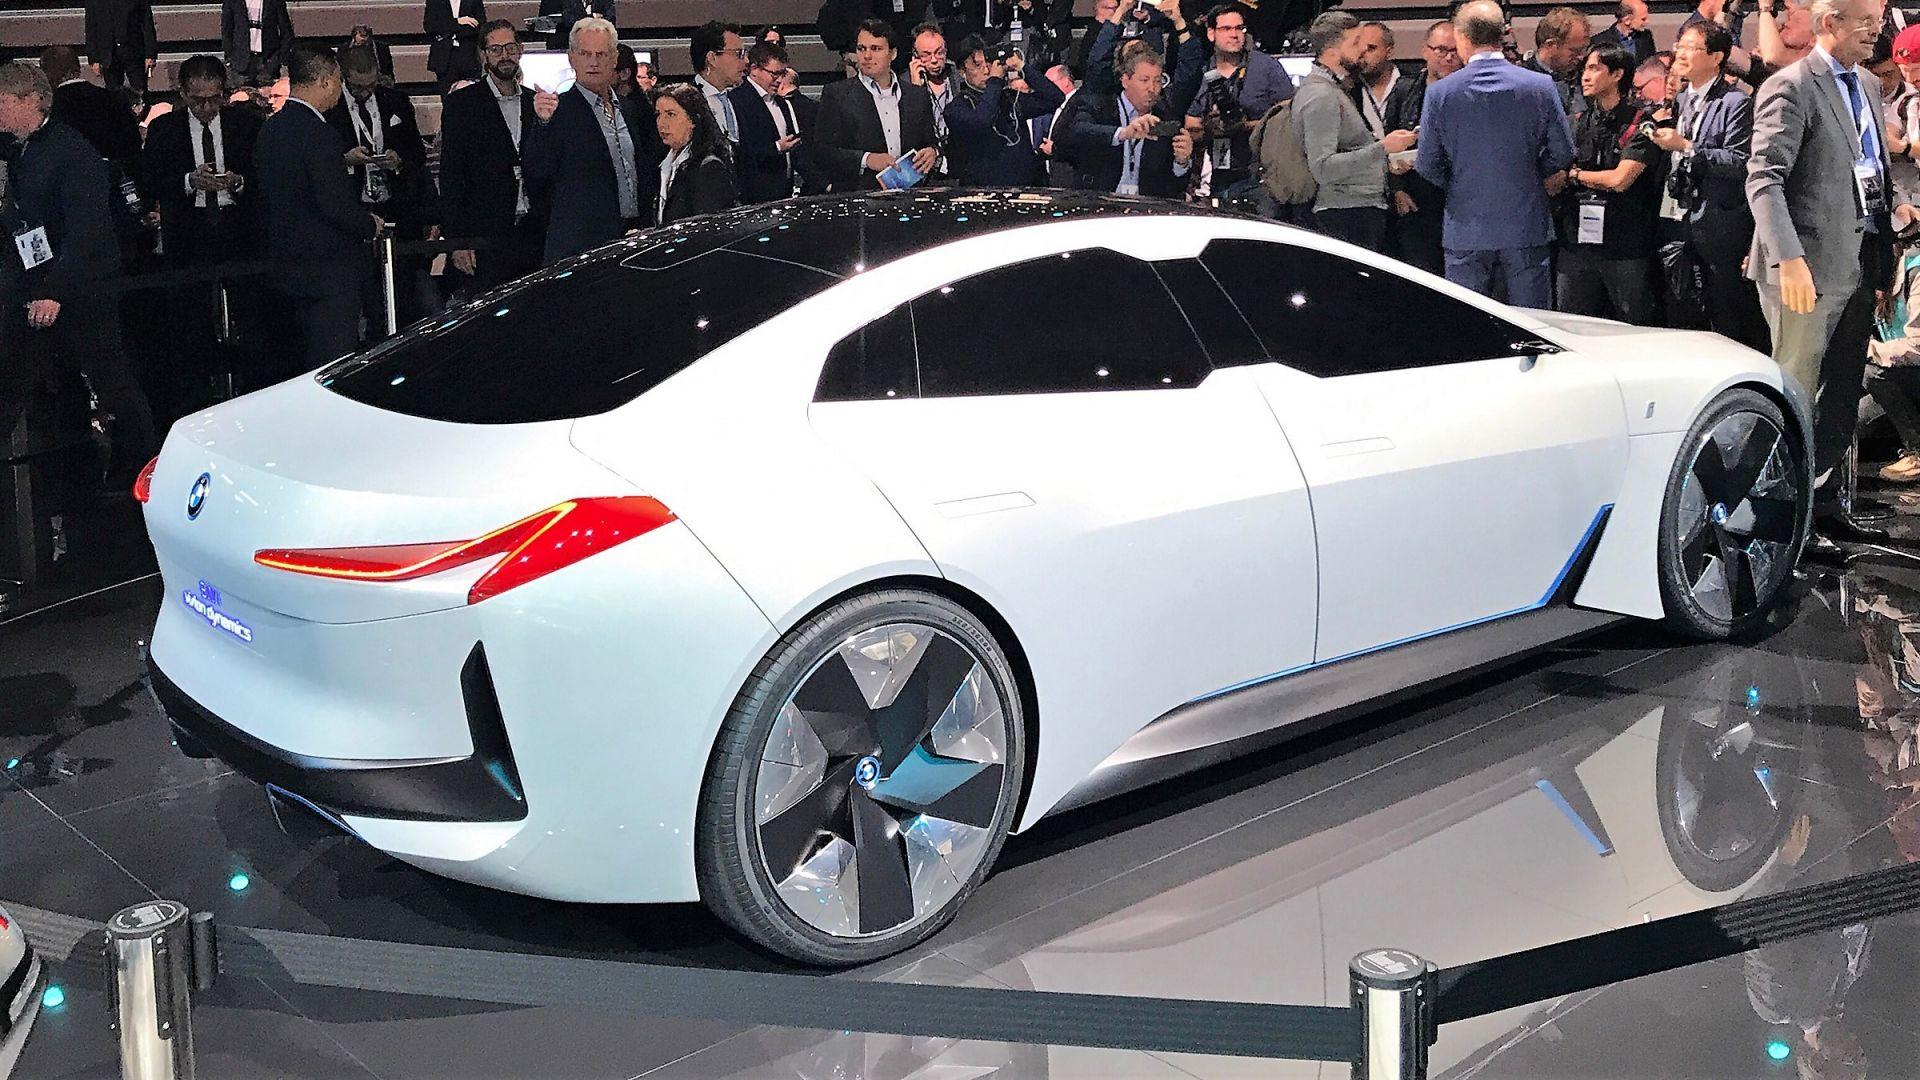 la nuova berlina elettrica bmw i4 avr u00e0 700 km di autonomia